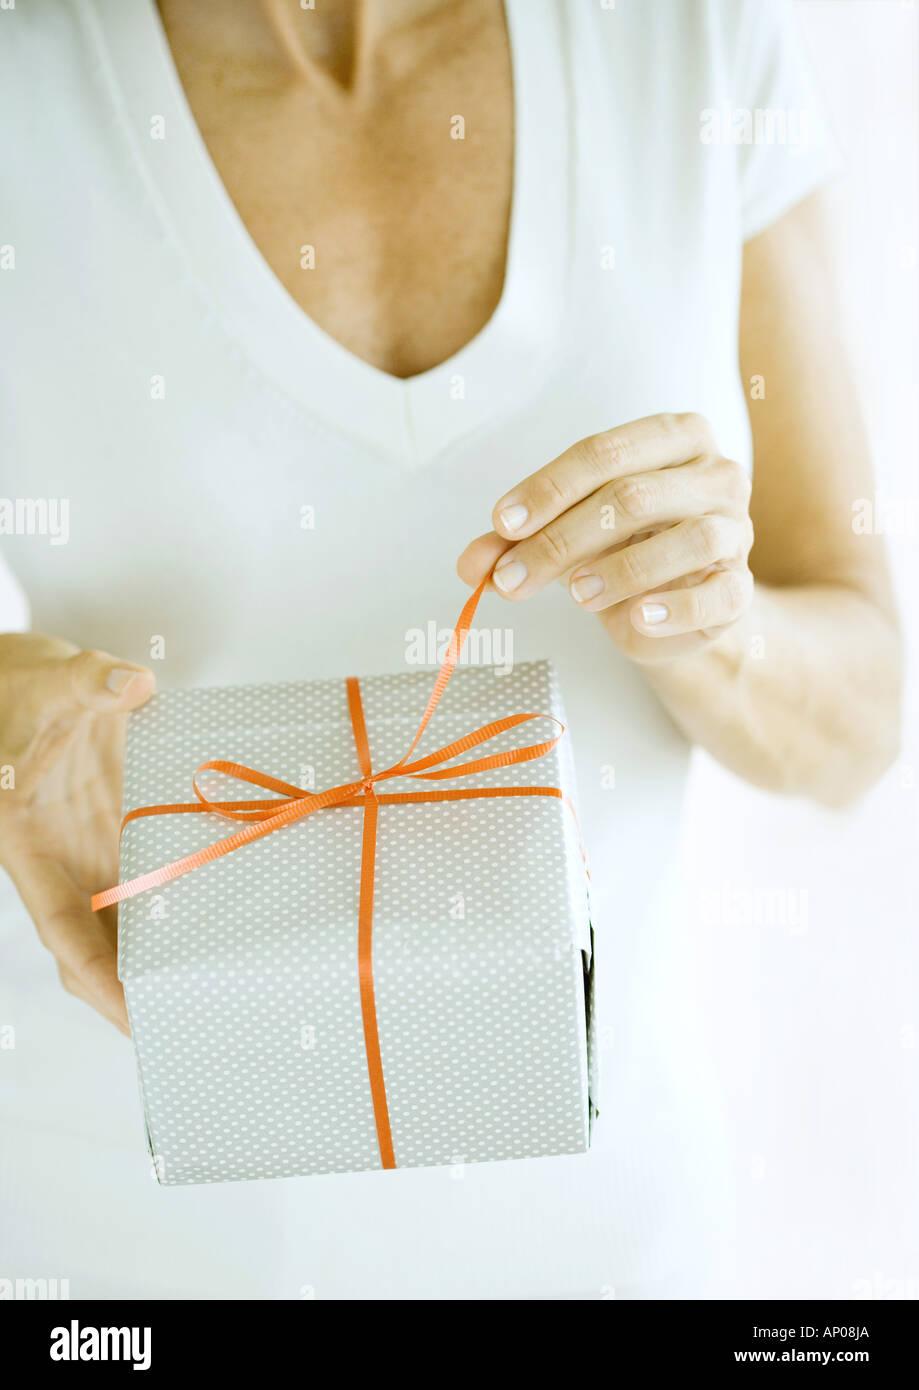 Woman pulling ribbon on present - Stock Image